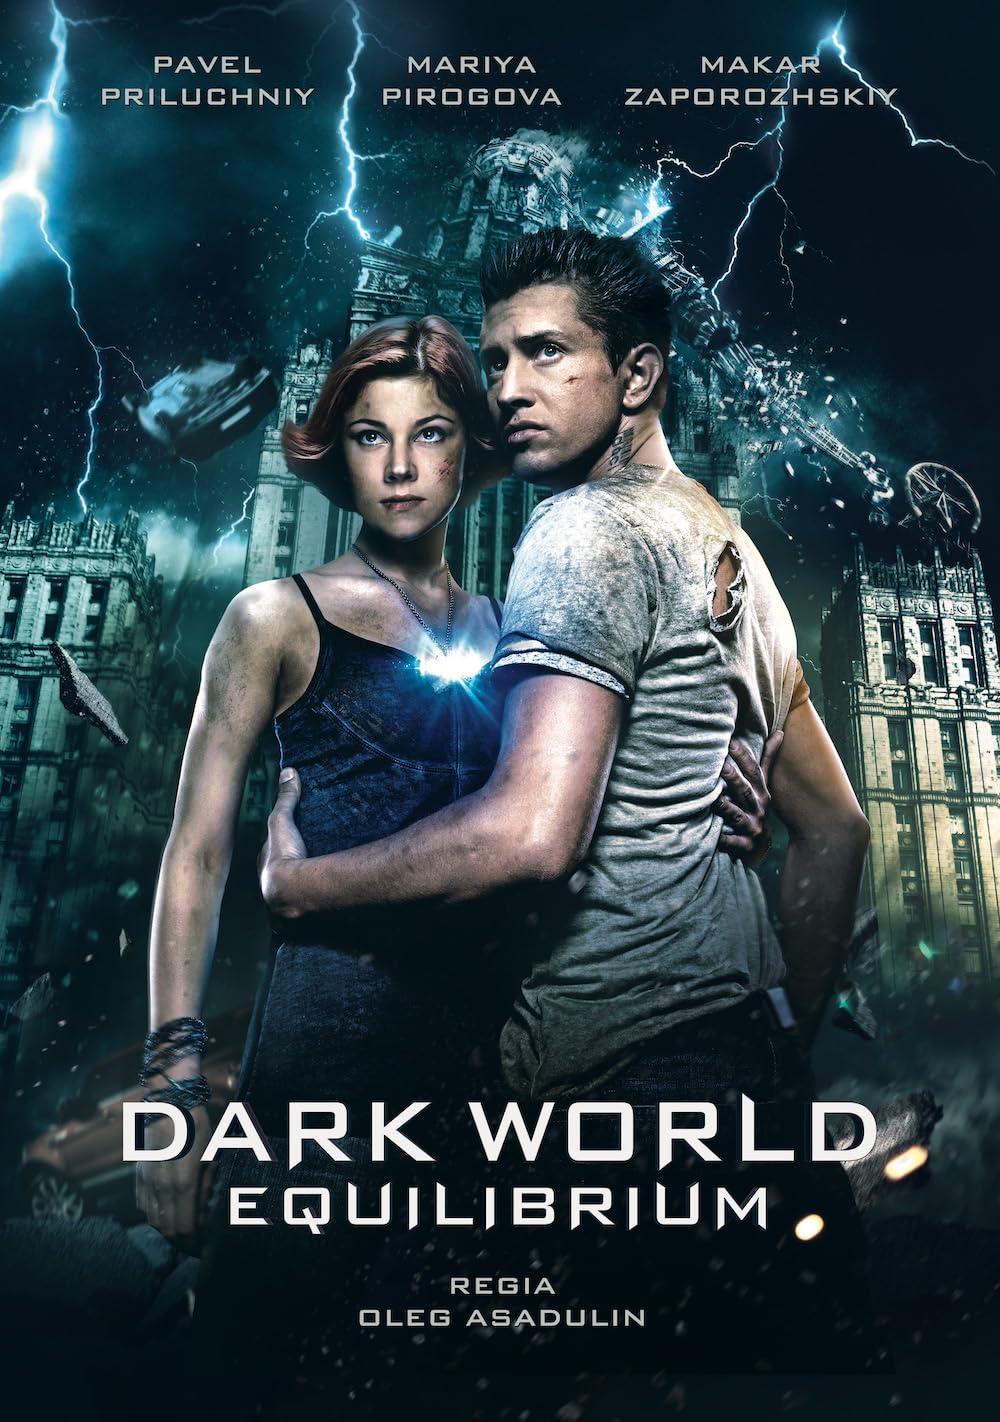 Dark World Equilibrium 2013 Hindi Dubbed 480p HDRip 300MB x264 AAC